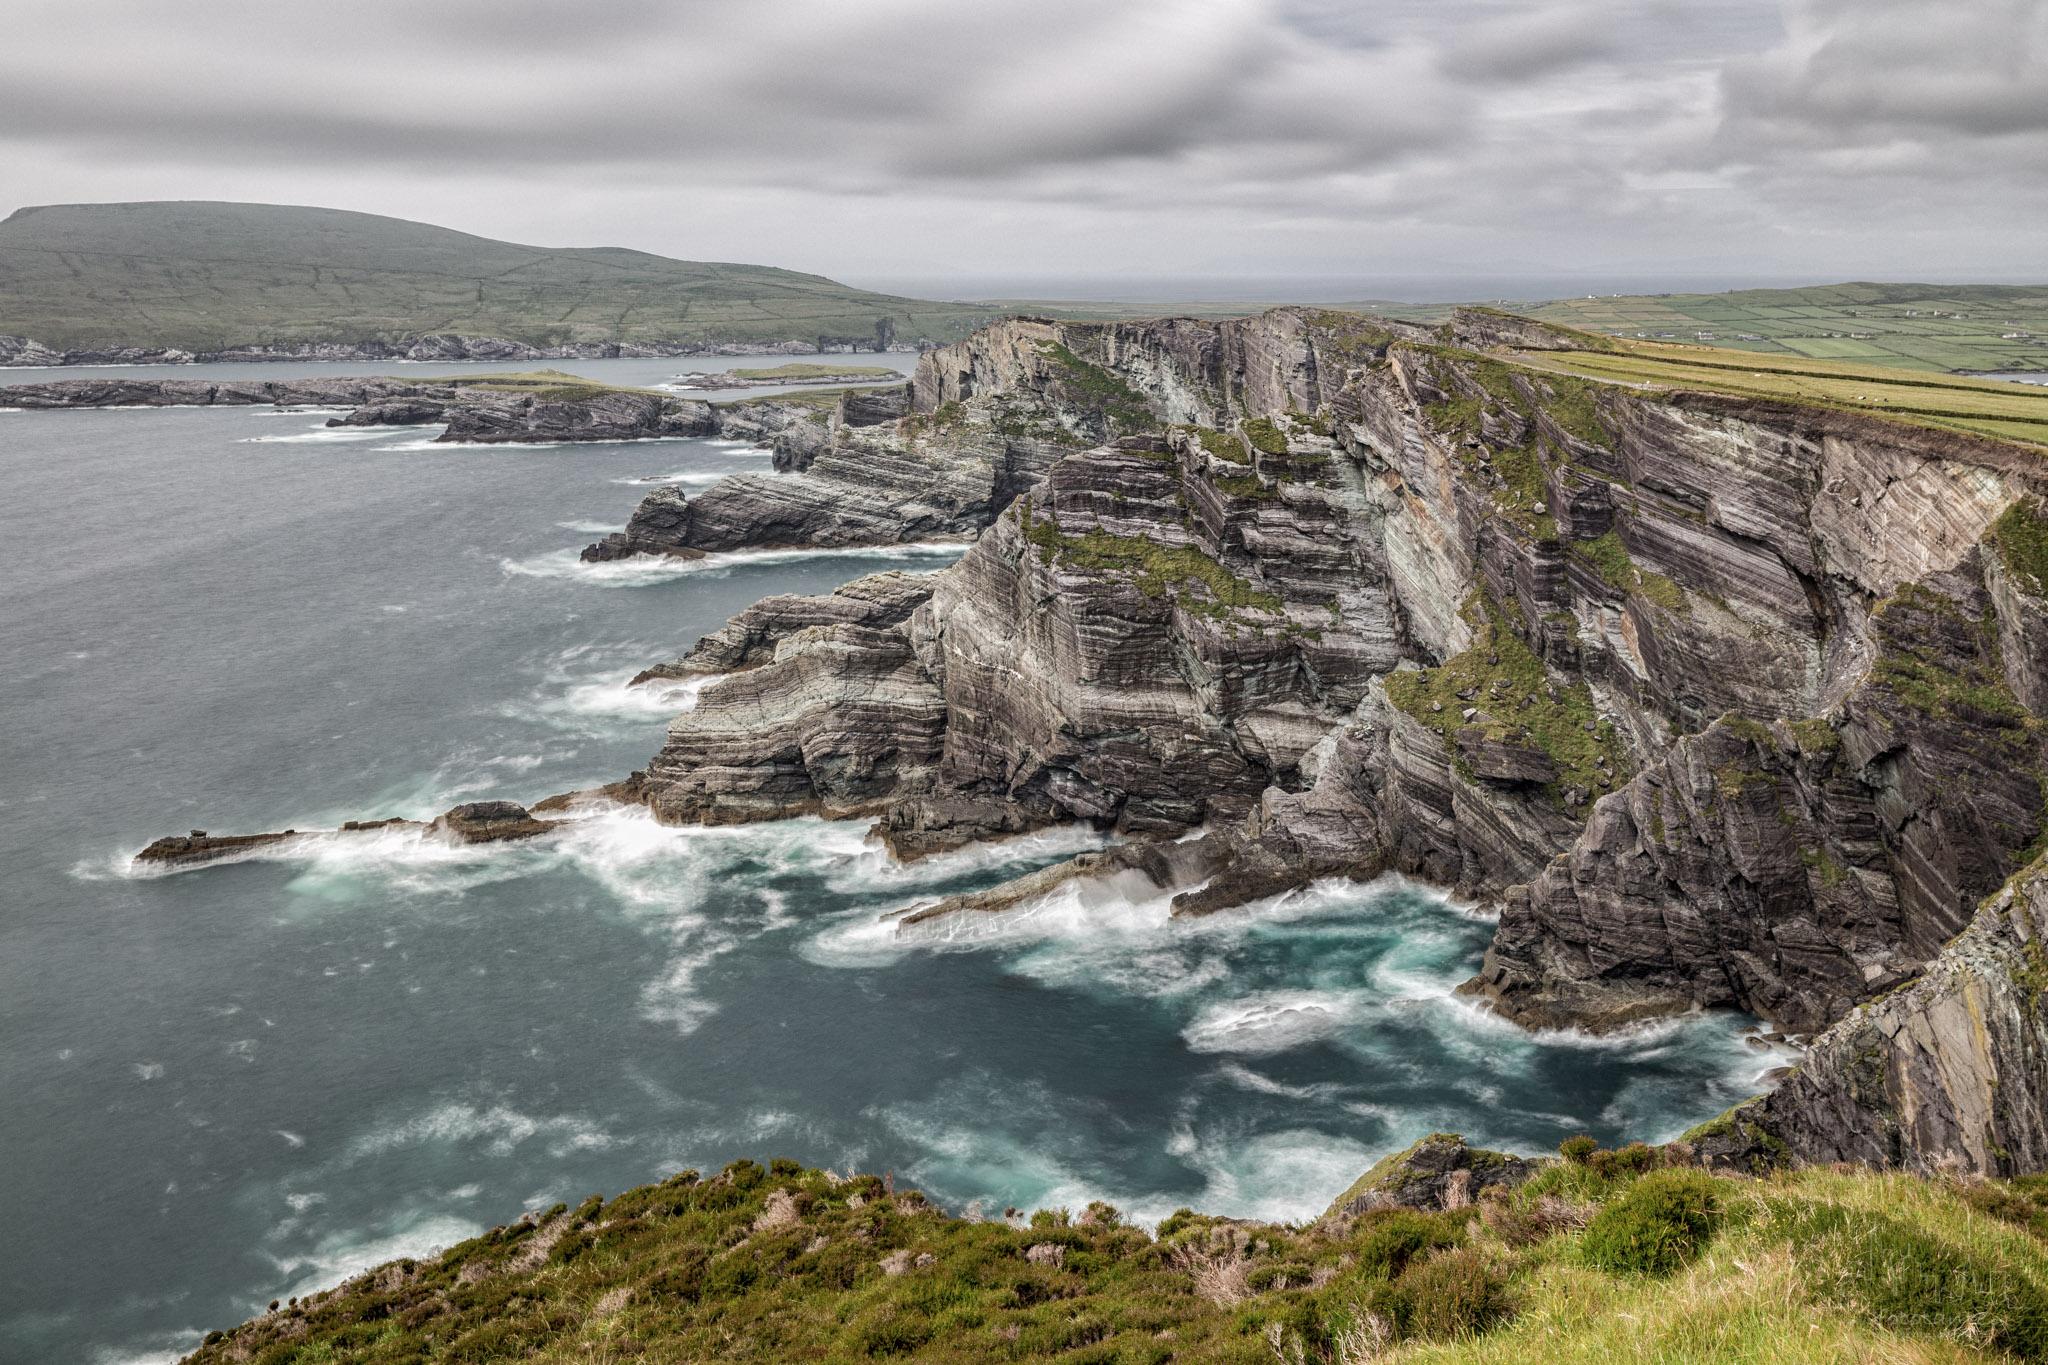 Kerry cliffs, Ireland